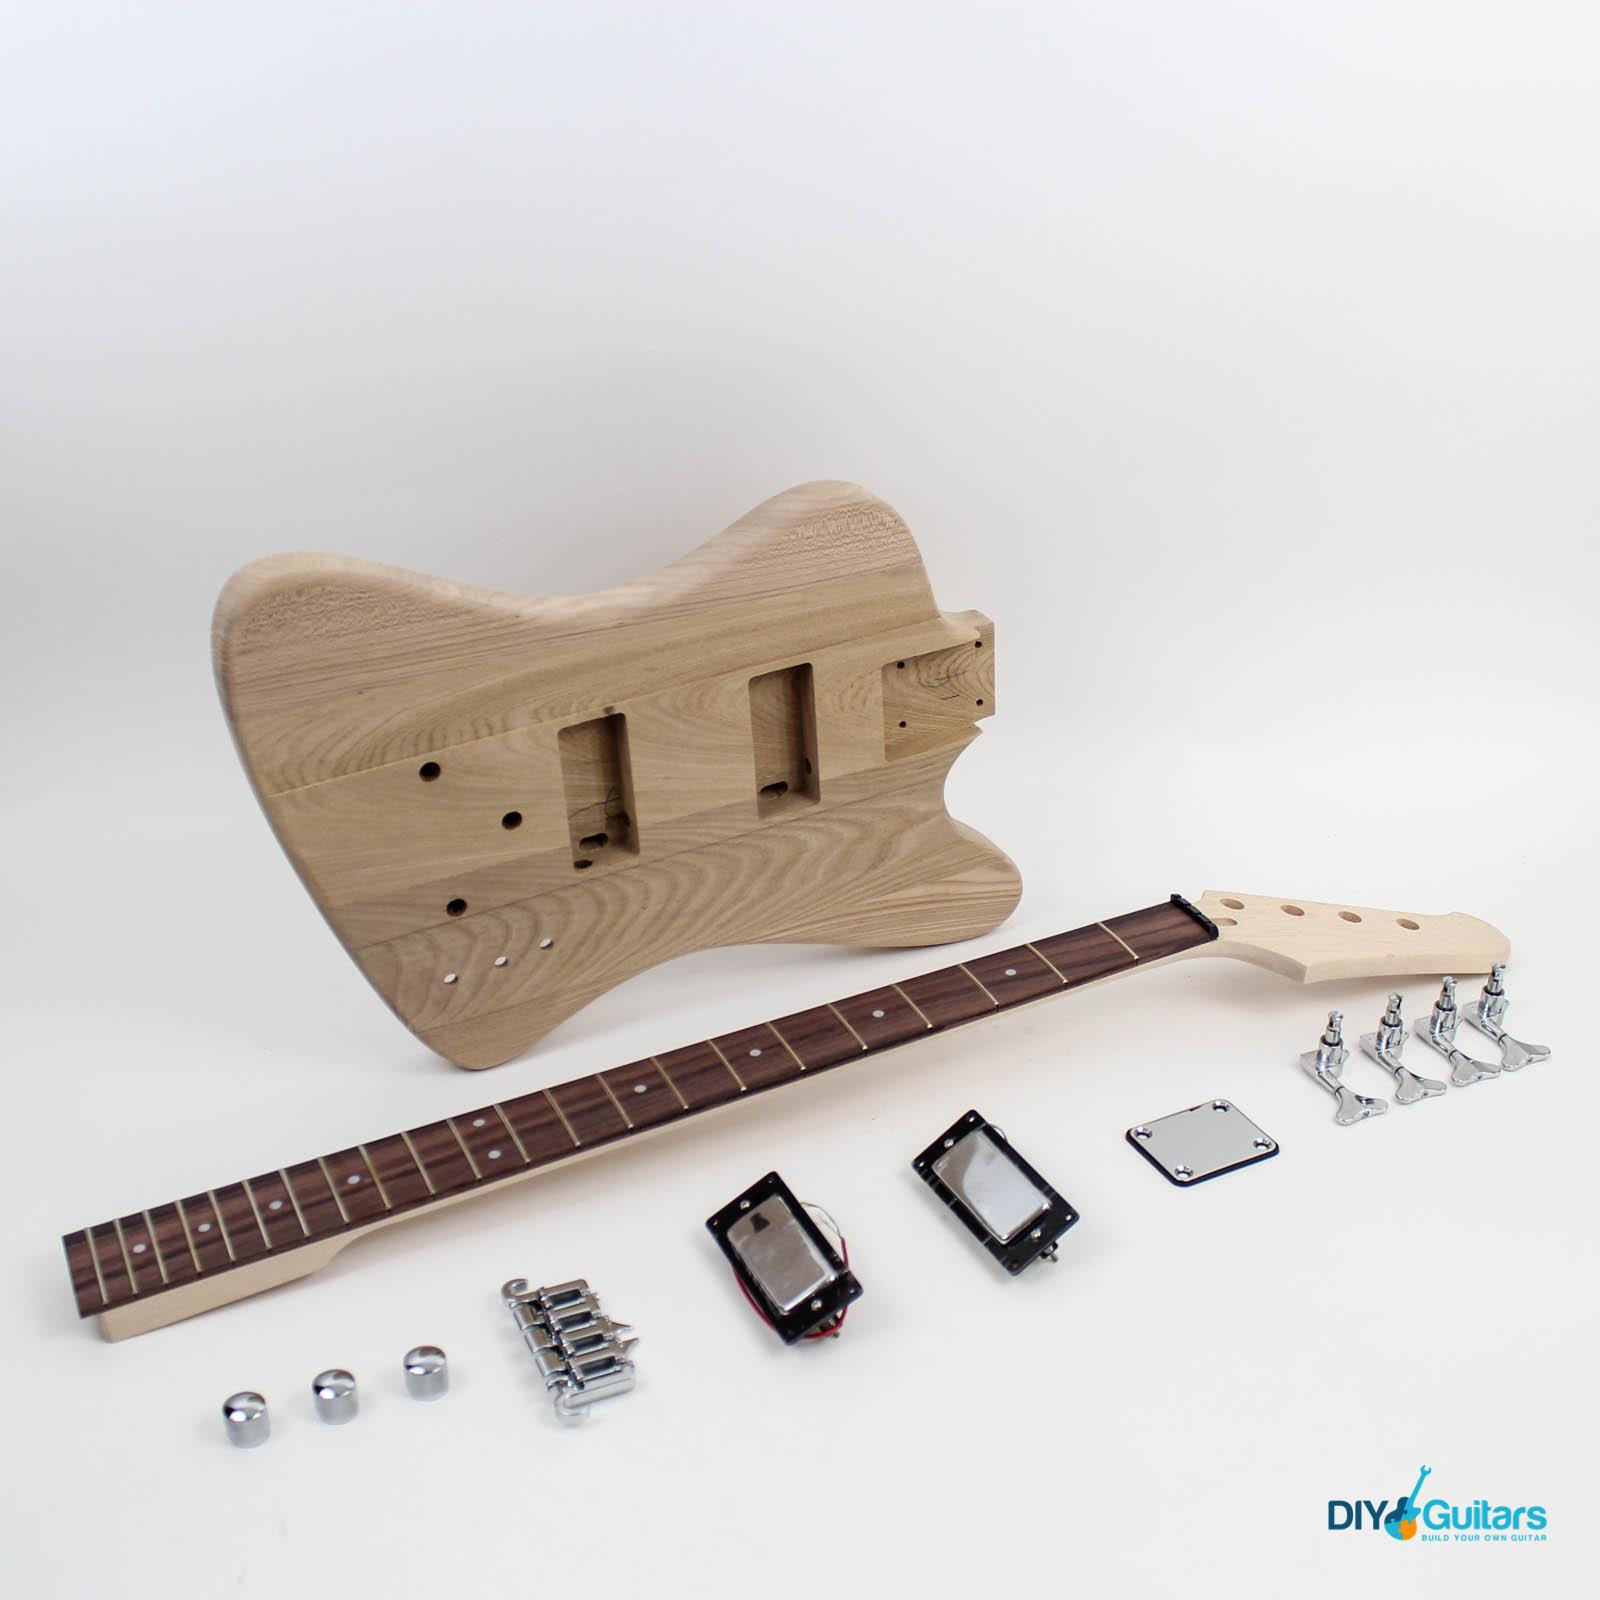 Bass guitar kits diyguitars gibson thunderbird diy electric bass kit main components solutioingenieria Choice Image